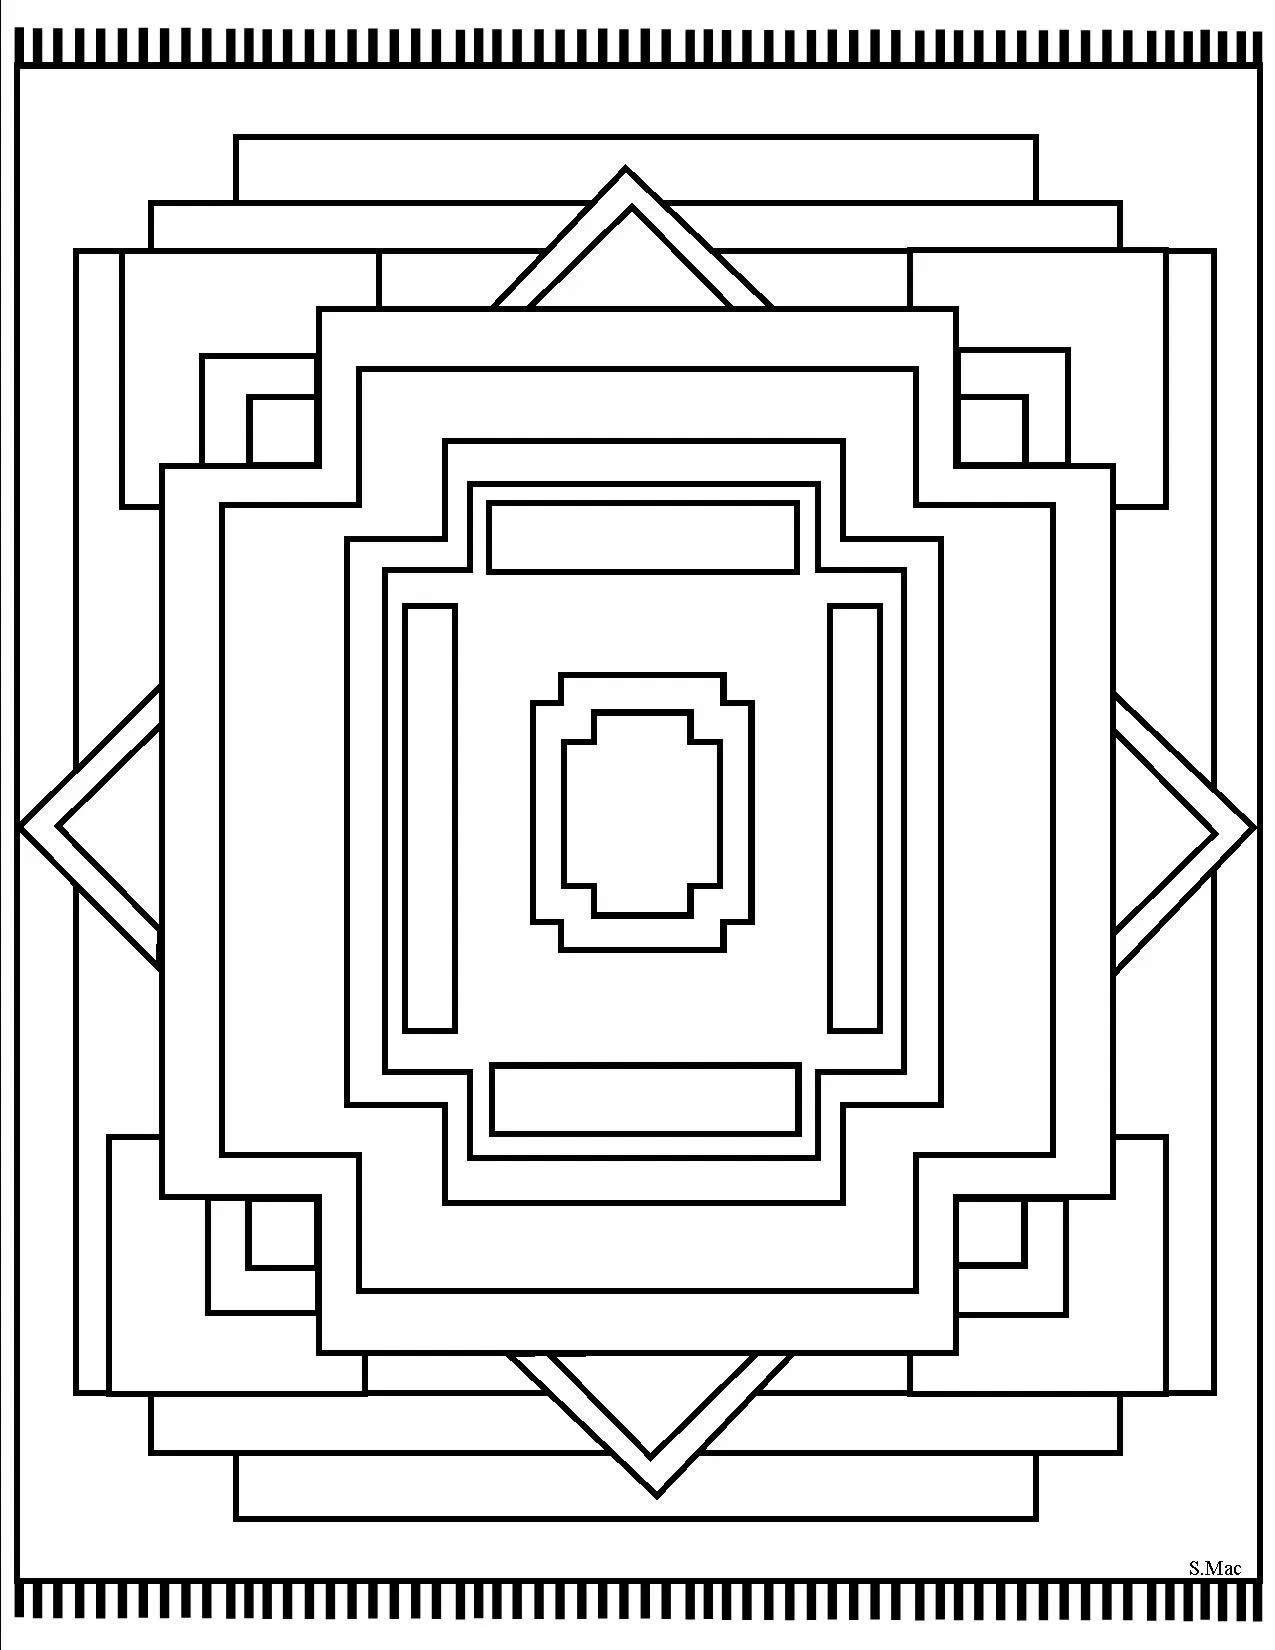 Imagem geométrico para imprimir